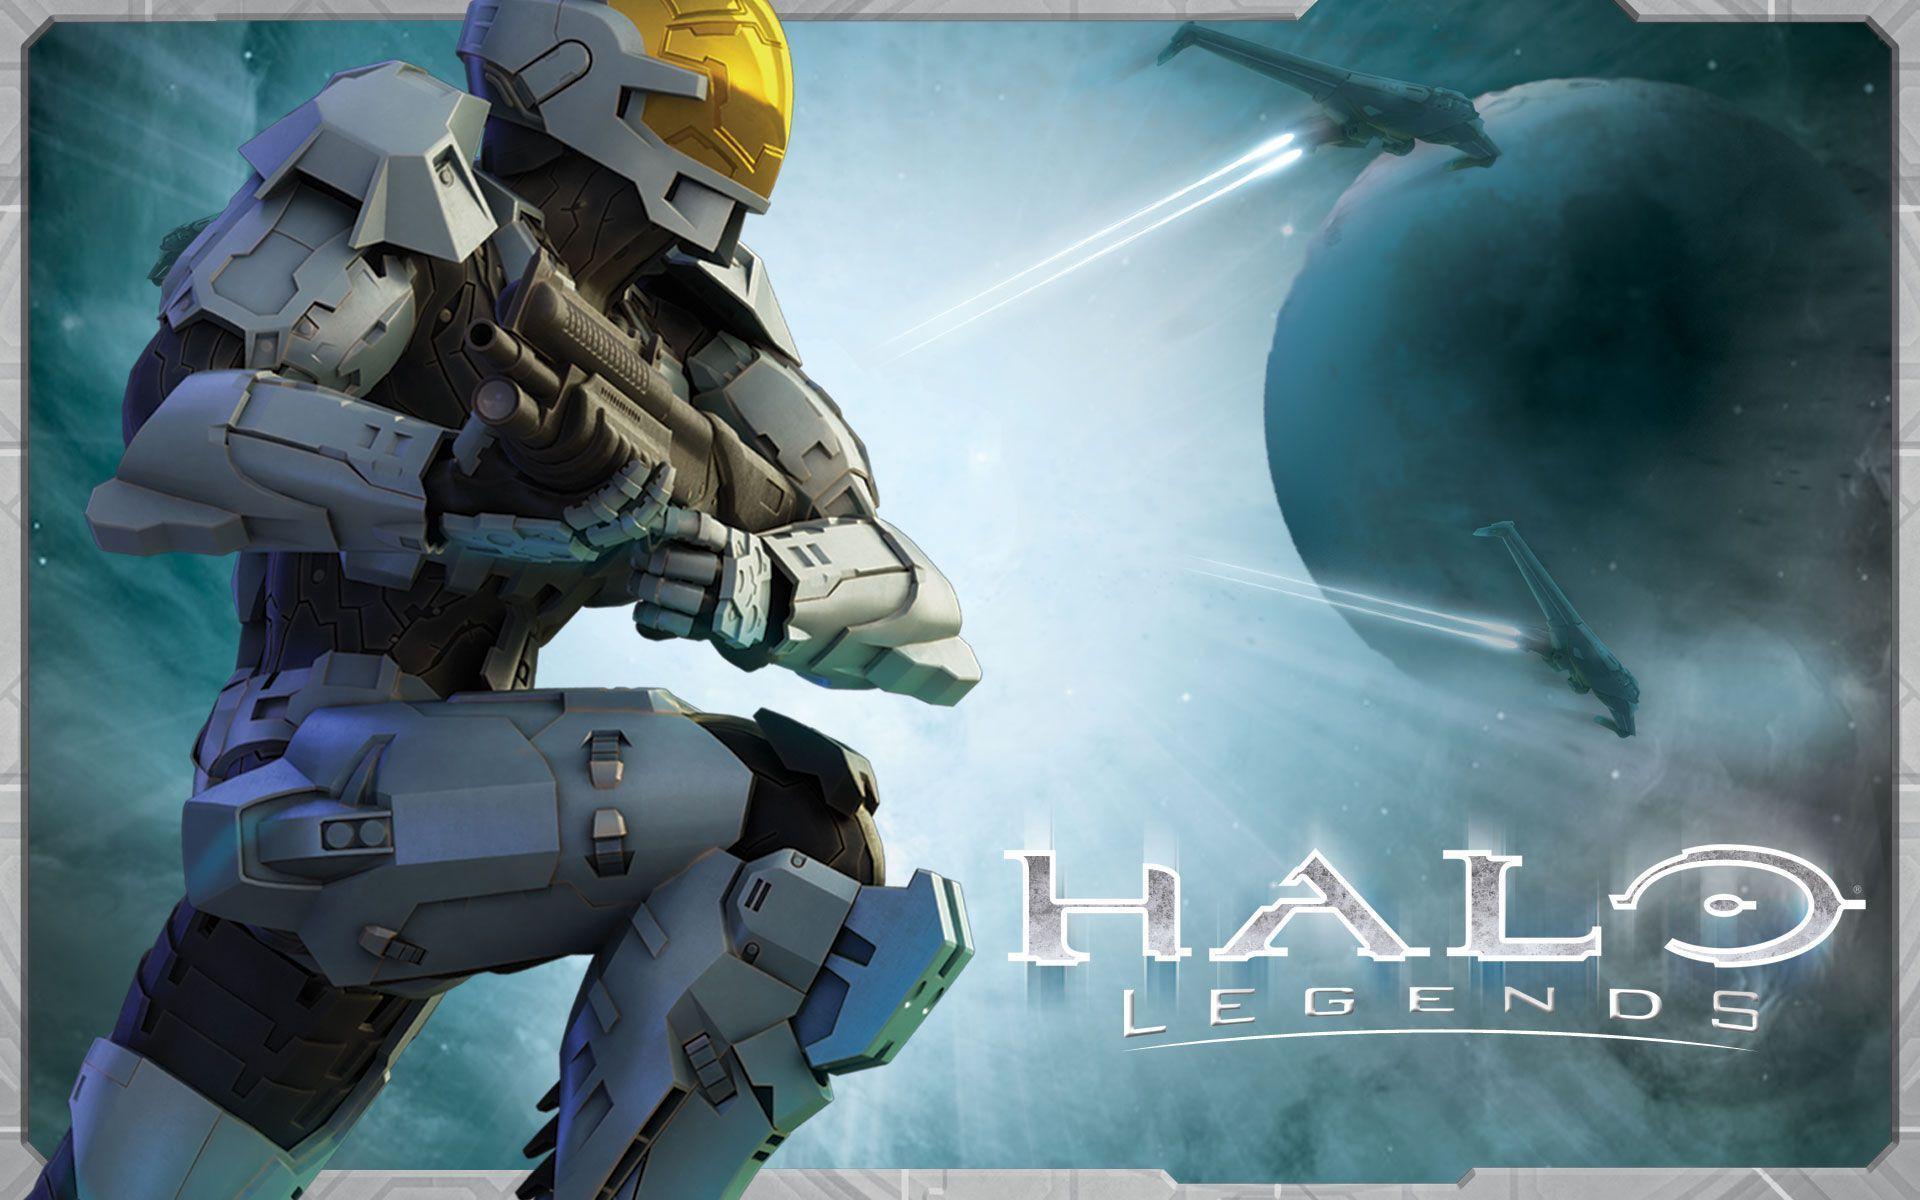 Halo Legends Kinox.To